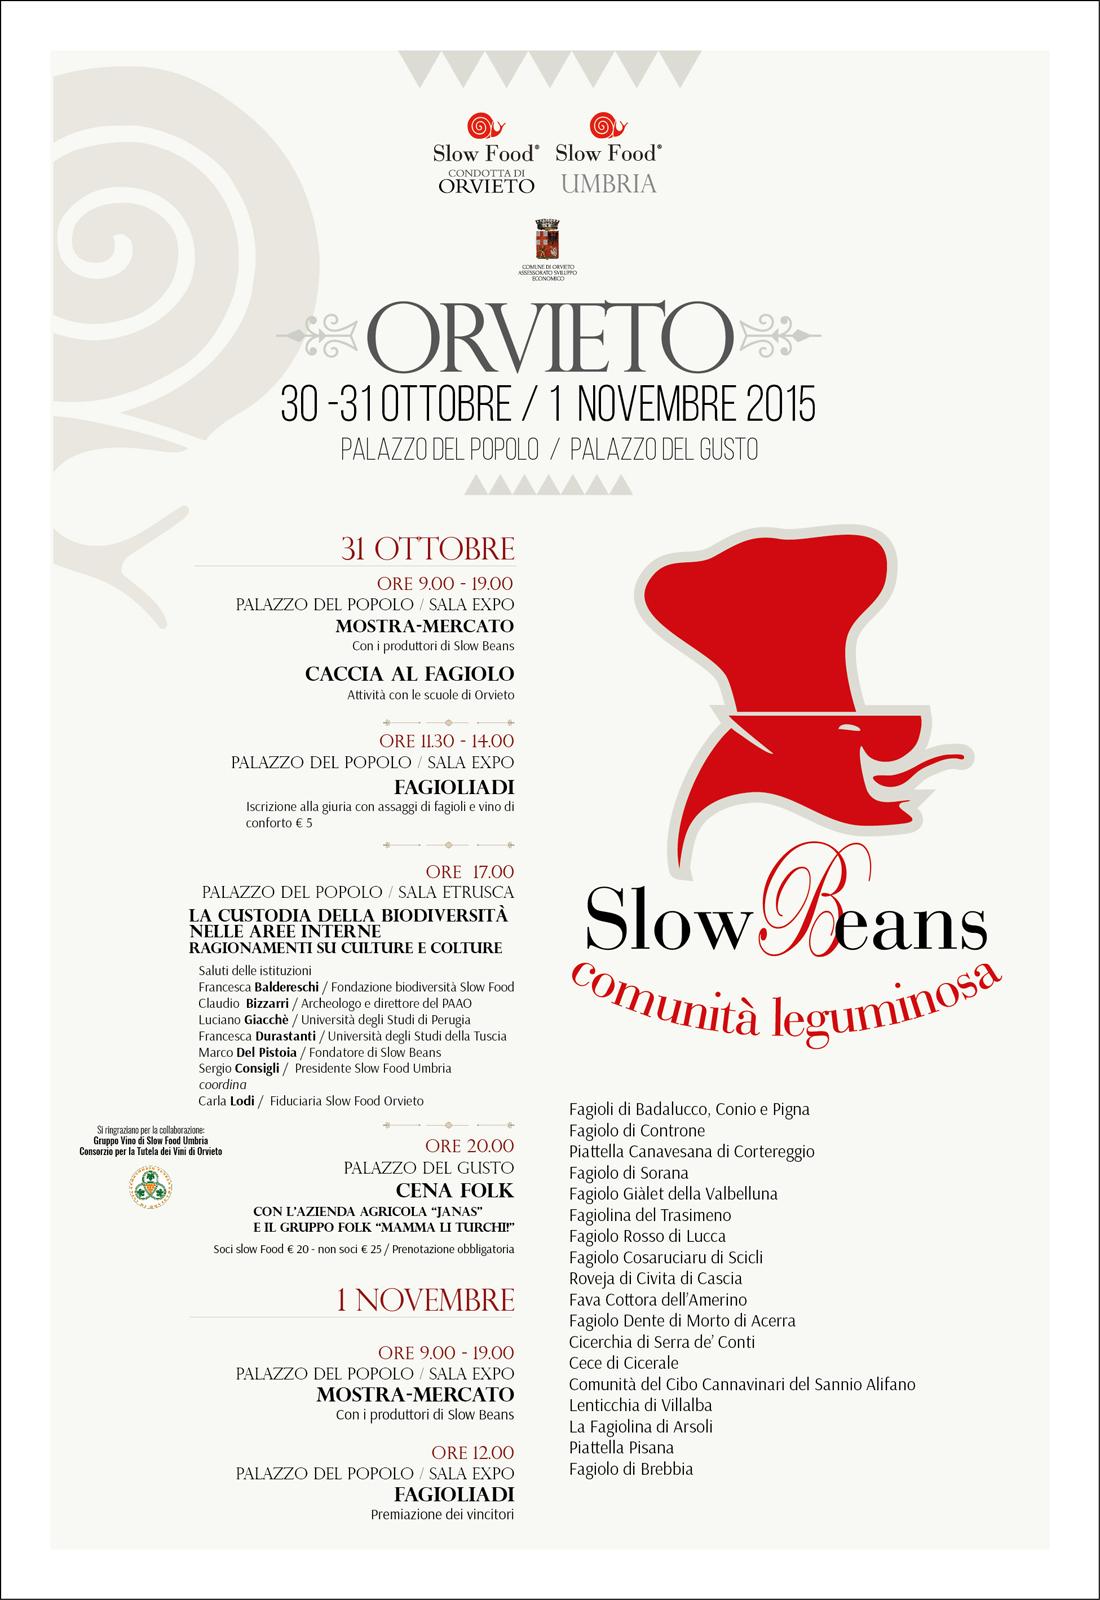 Slow Beans Orvieto 2015